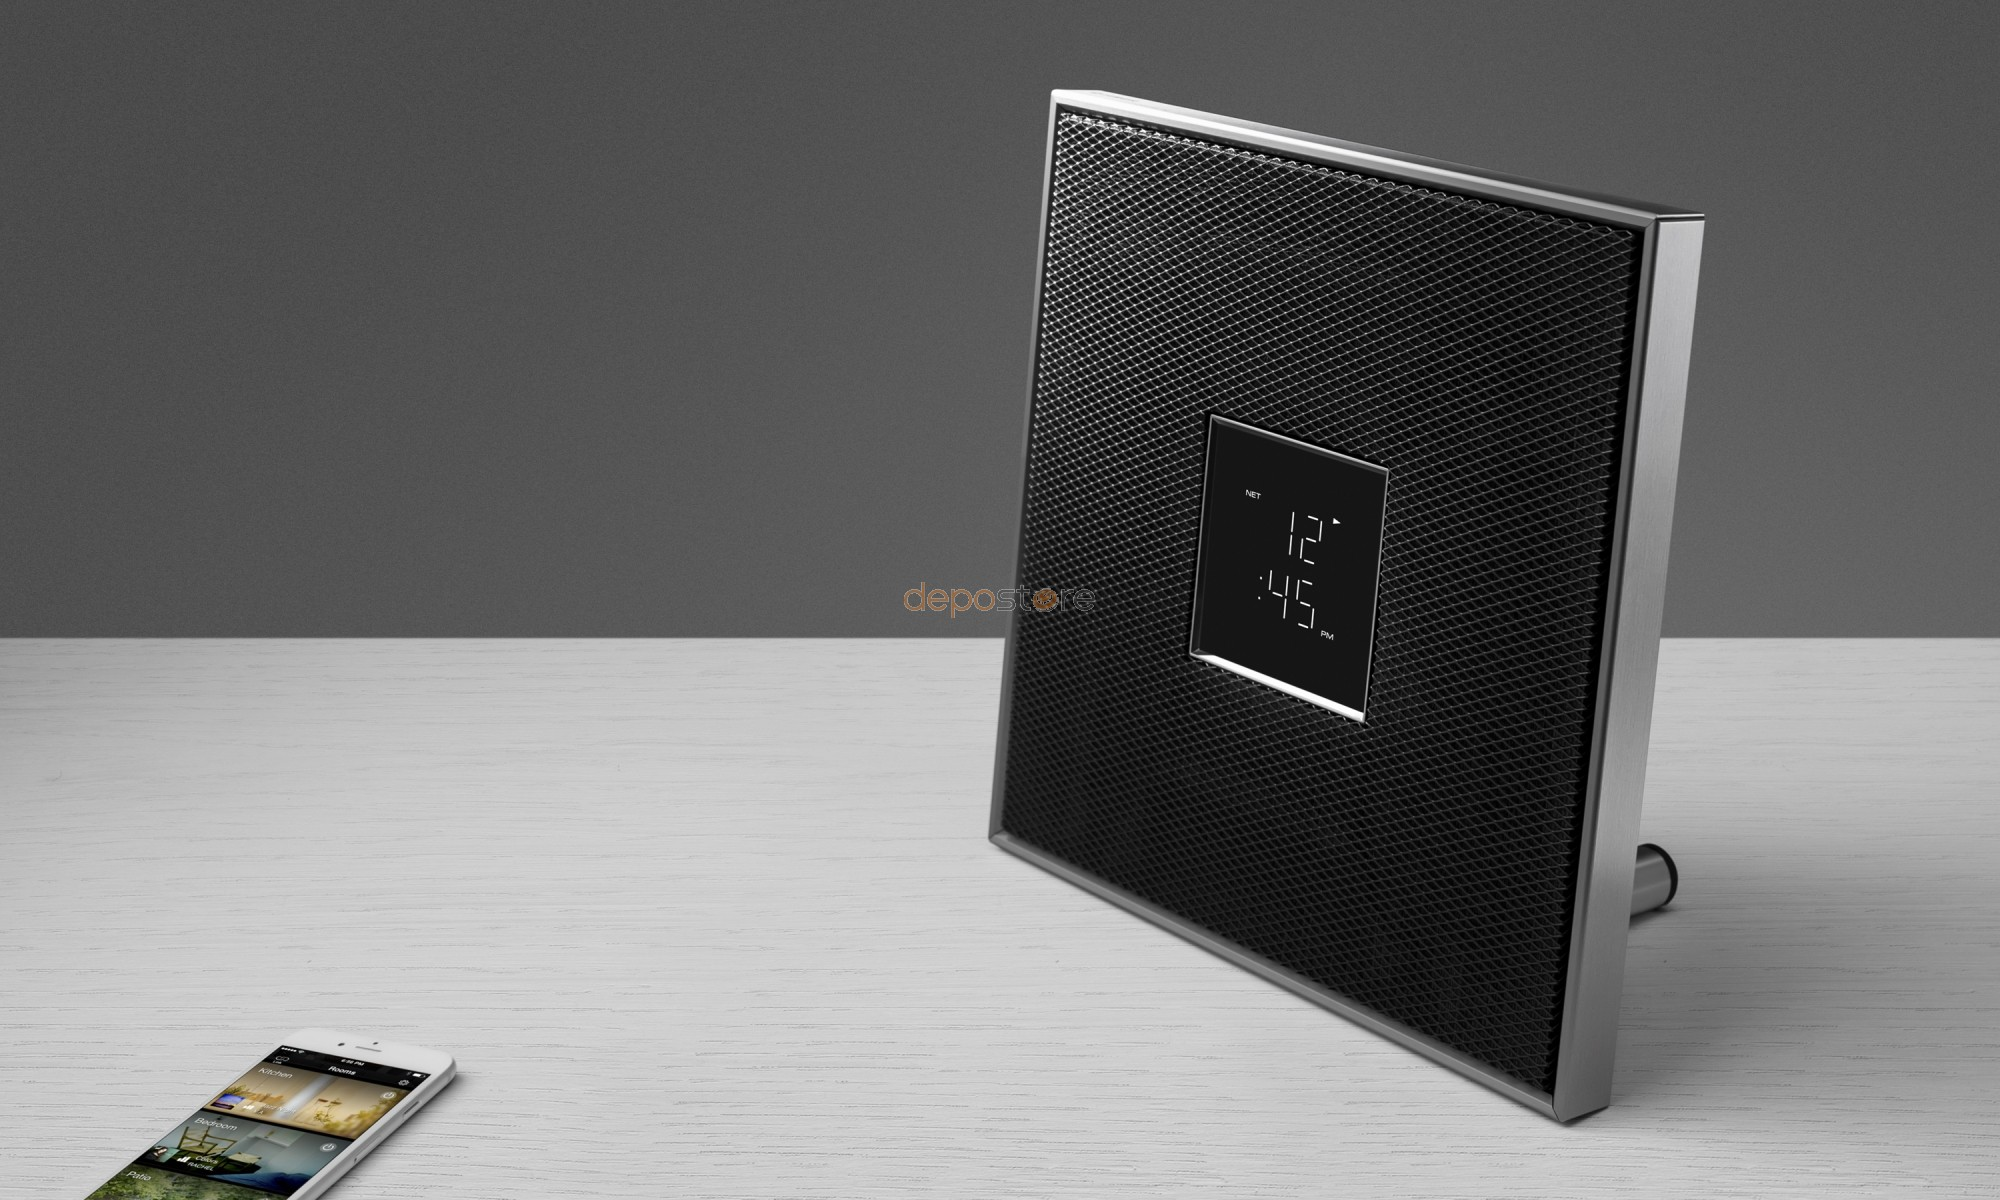 yamaha isx80 hangsz r. Black Bedroom Furniture Sets. Home Design Ideas